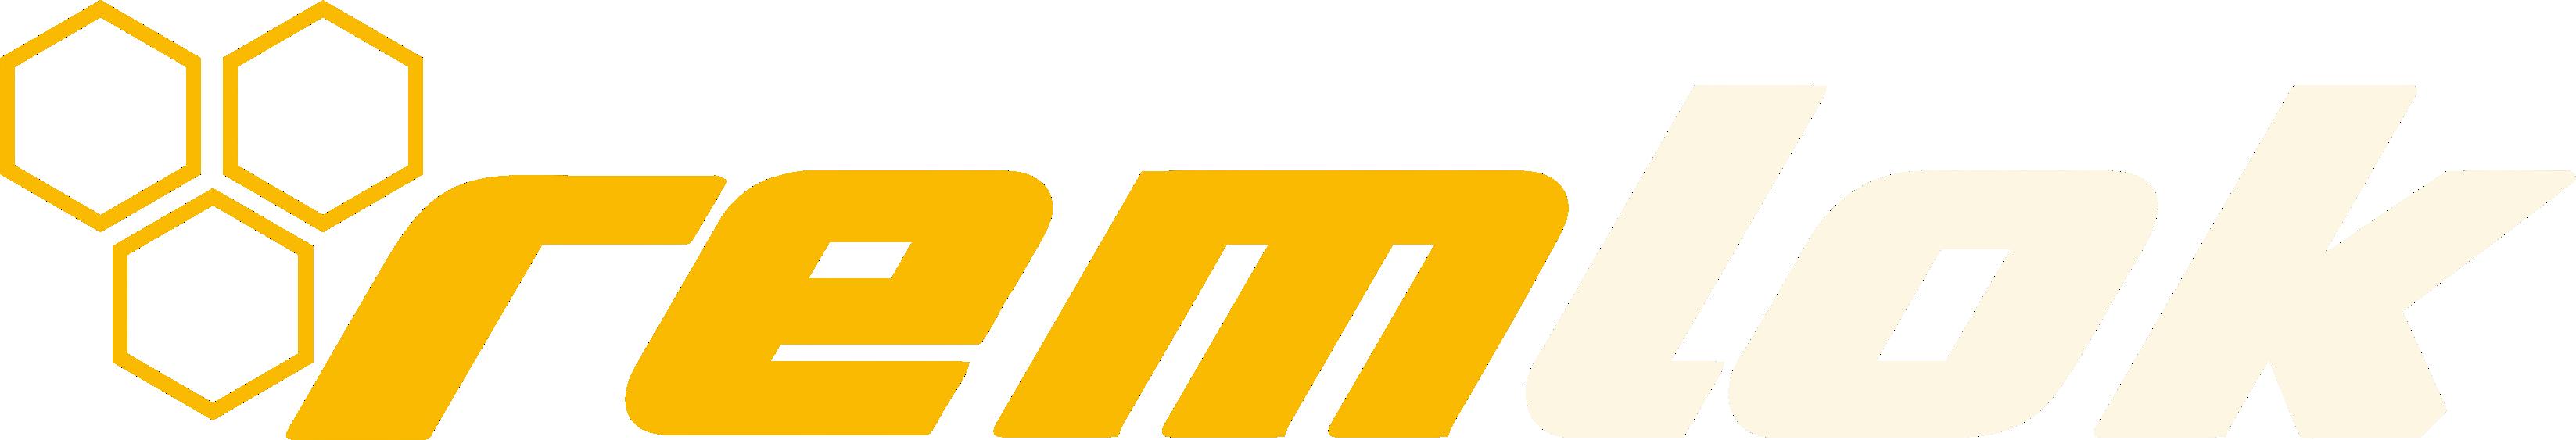 Remlok